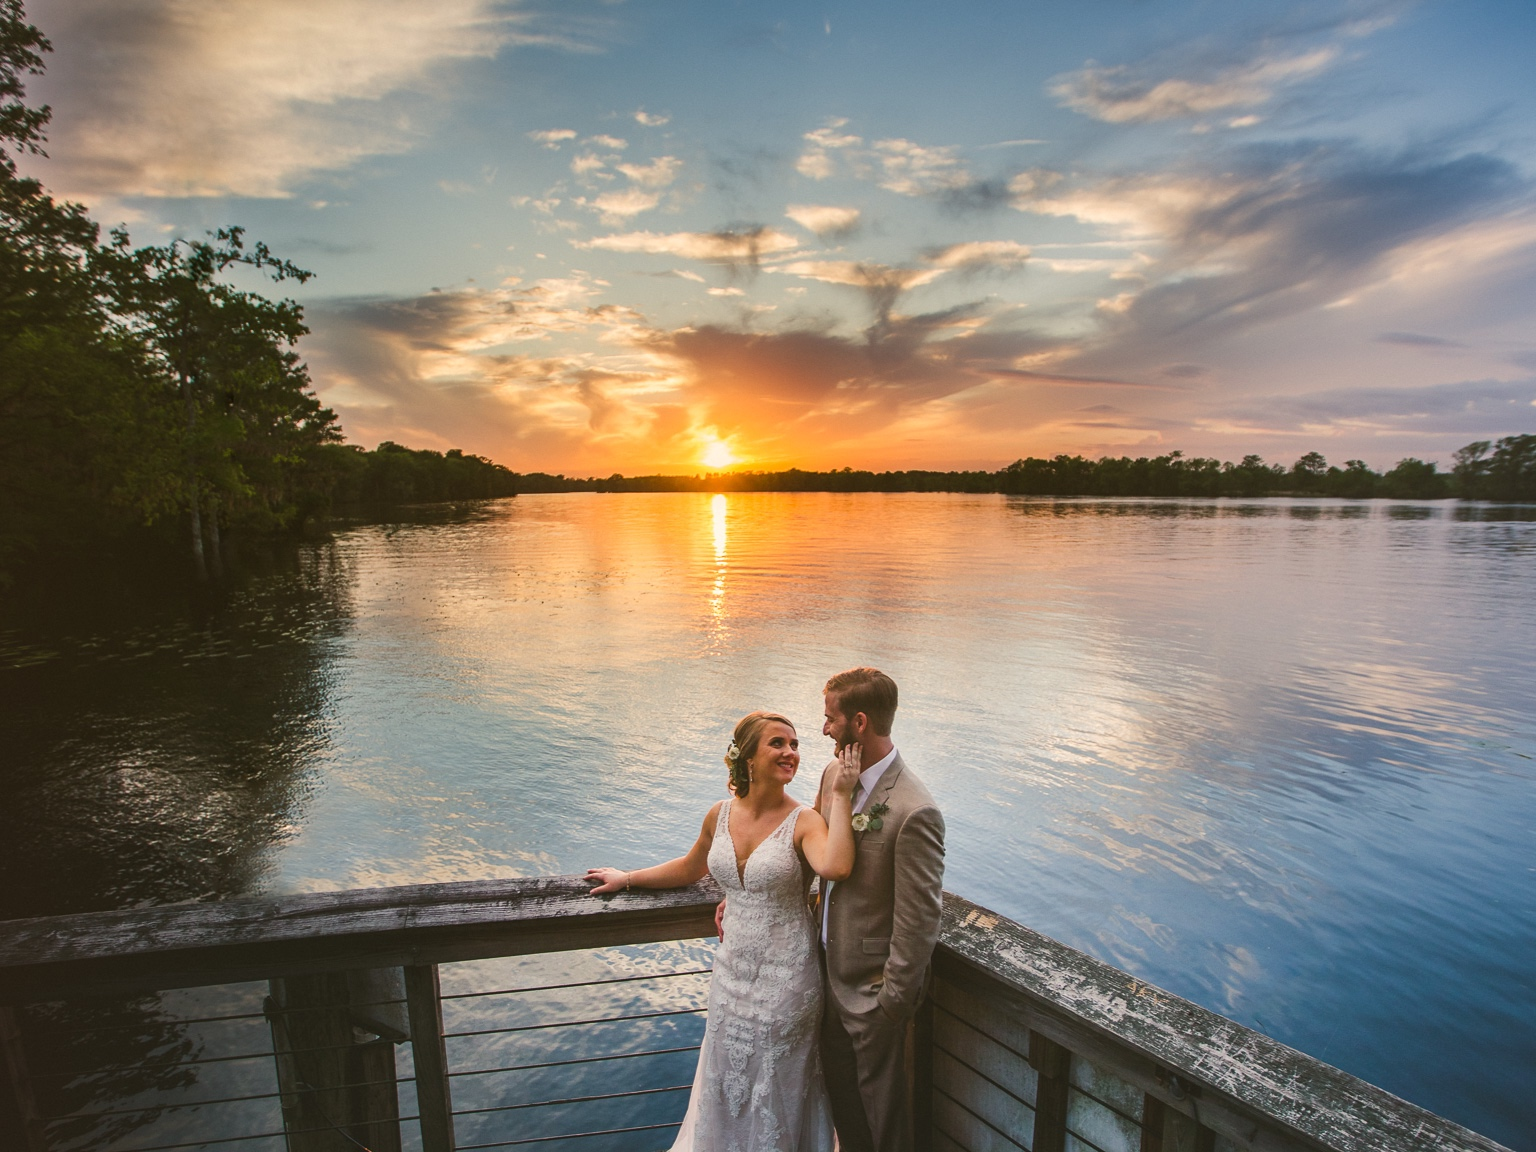 Ruta & Nick // Wedding - Reserve Harbor Yacht Club Pawleys Island, SC